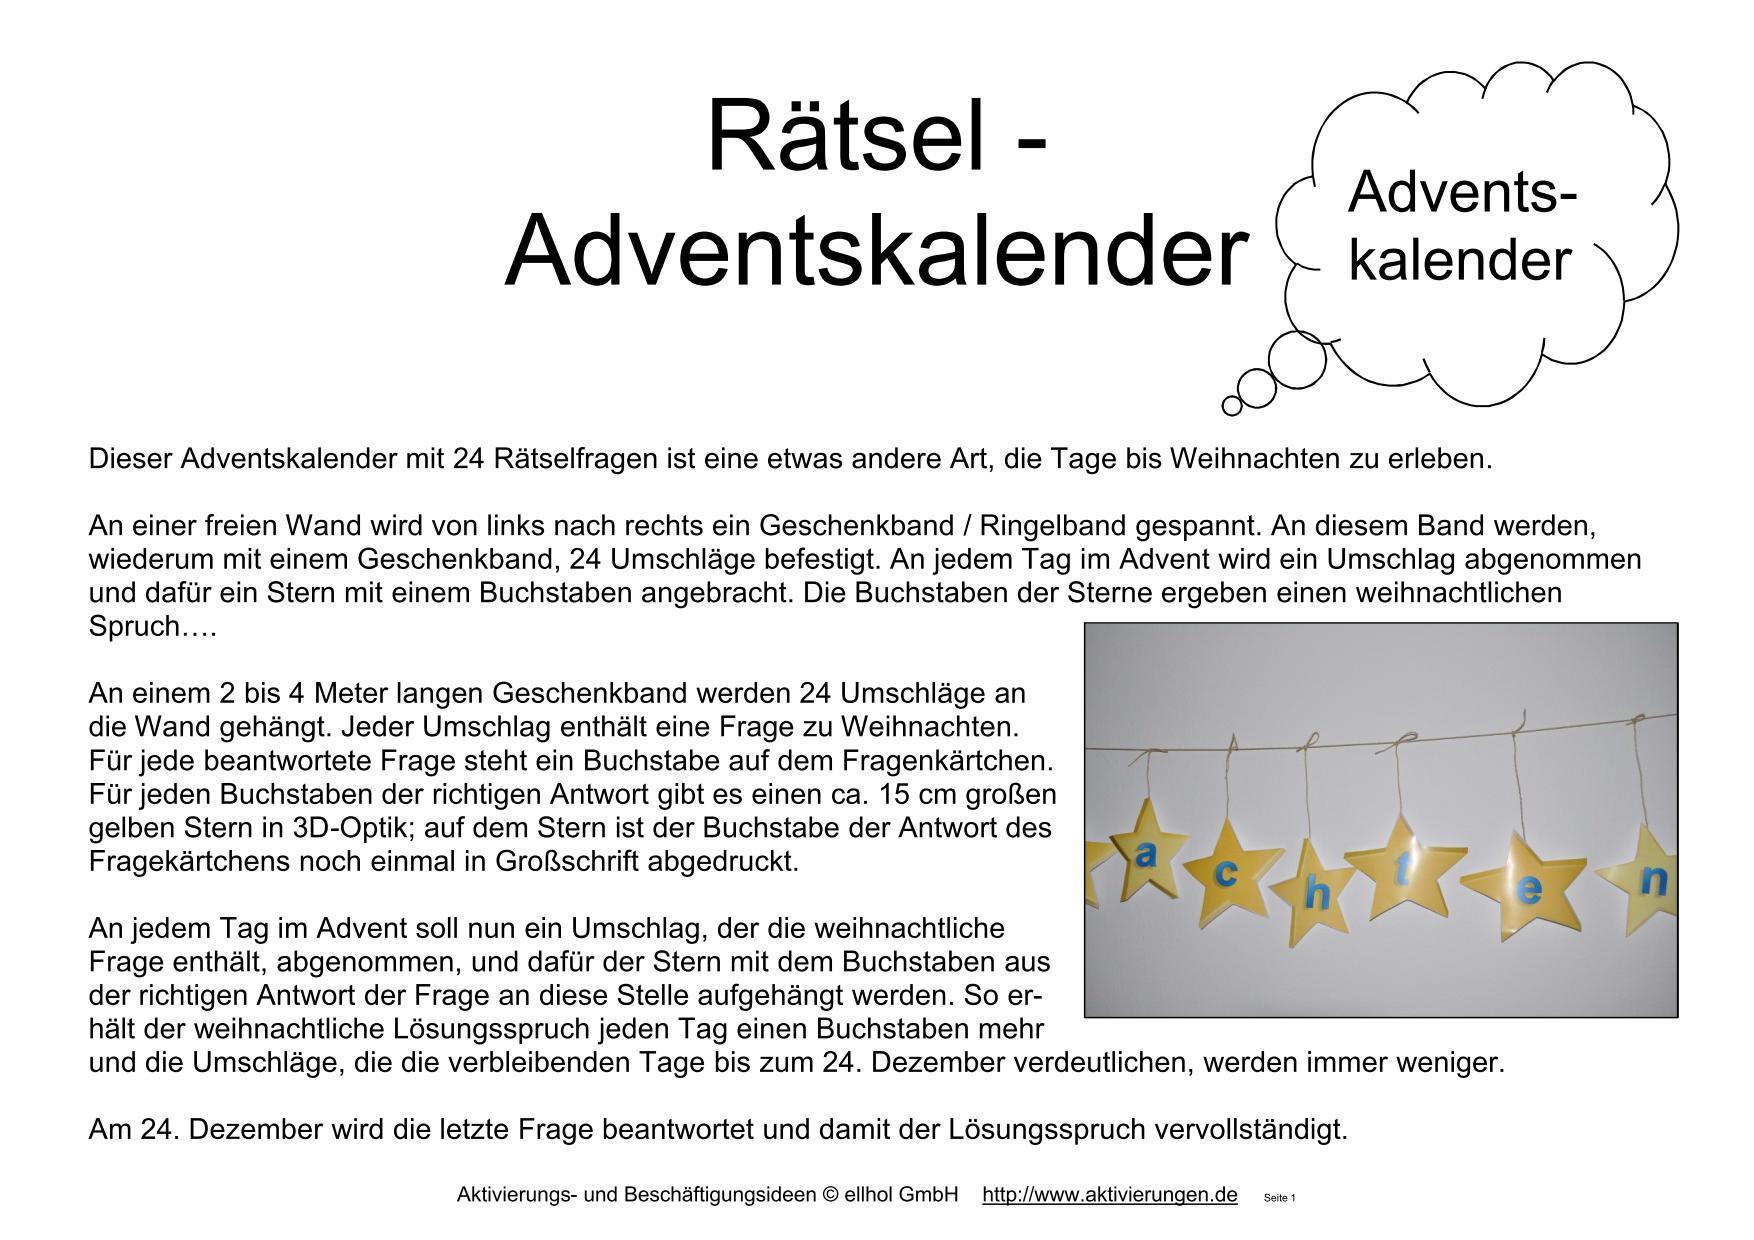 24 Große Gelbe Sterne Für Dem Rätsel-Adventskalender Für bei Adventskalender Rätsel Zum Ausdrucken